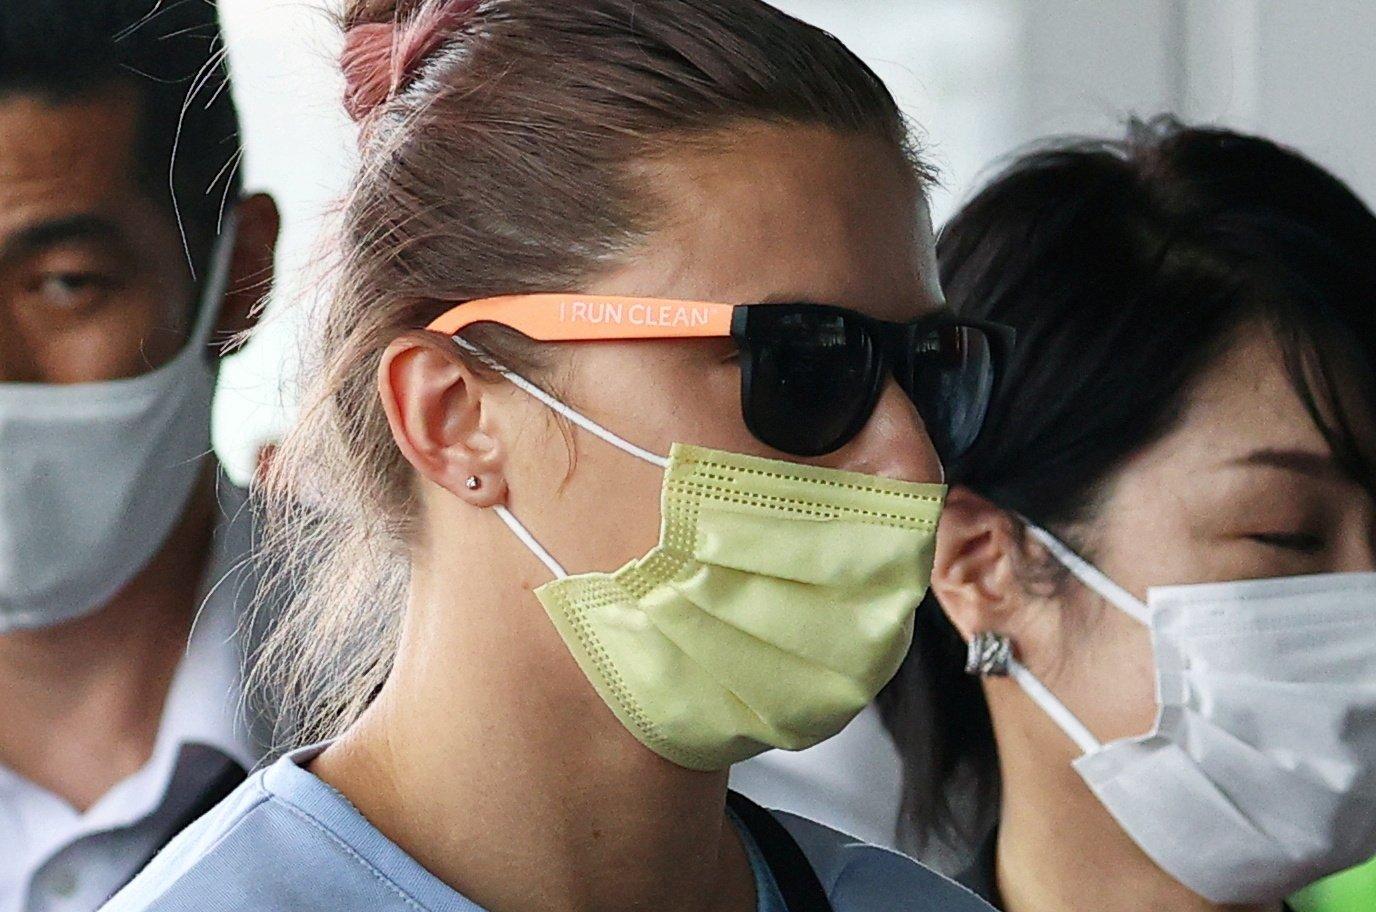 Belarusian Sprinter Krystsina Tsimanouskaya, who took refuge in the Polish embassy in Tokyo, arrives at Narita International Airport to leave for Vienna, in Narita, Tokyo, Japan, Aug. 4, 2021. (AFP Photo)